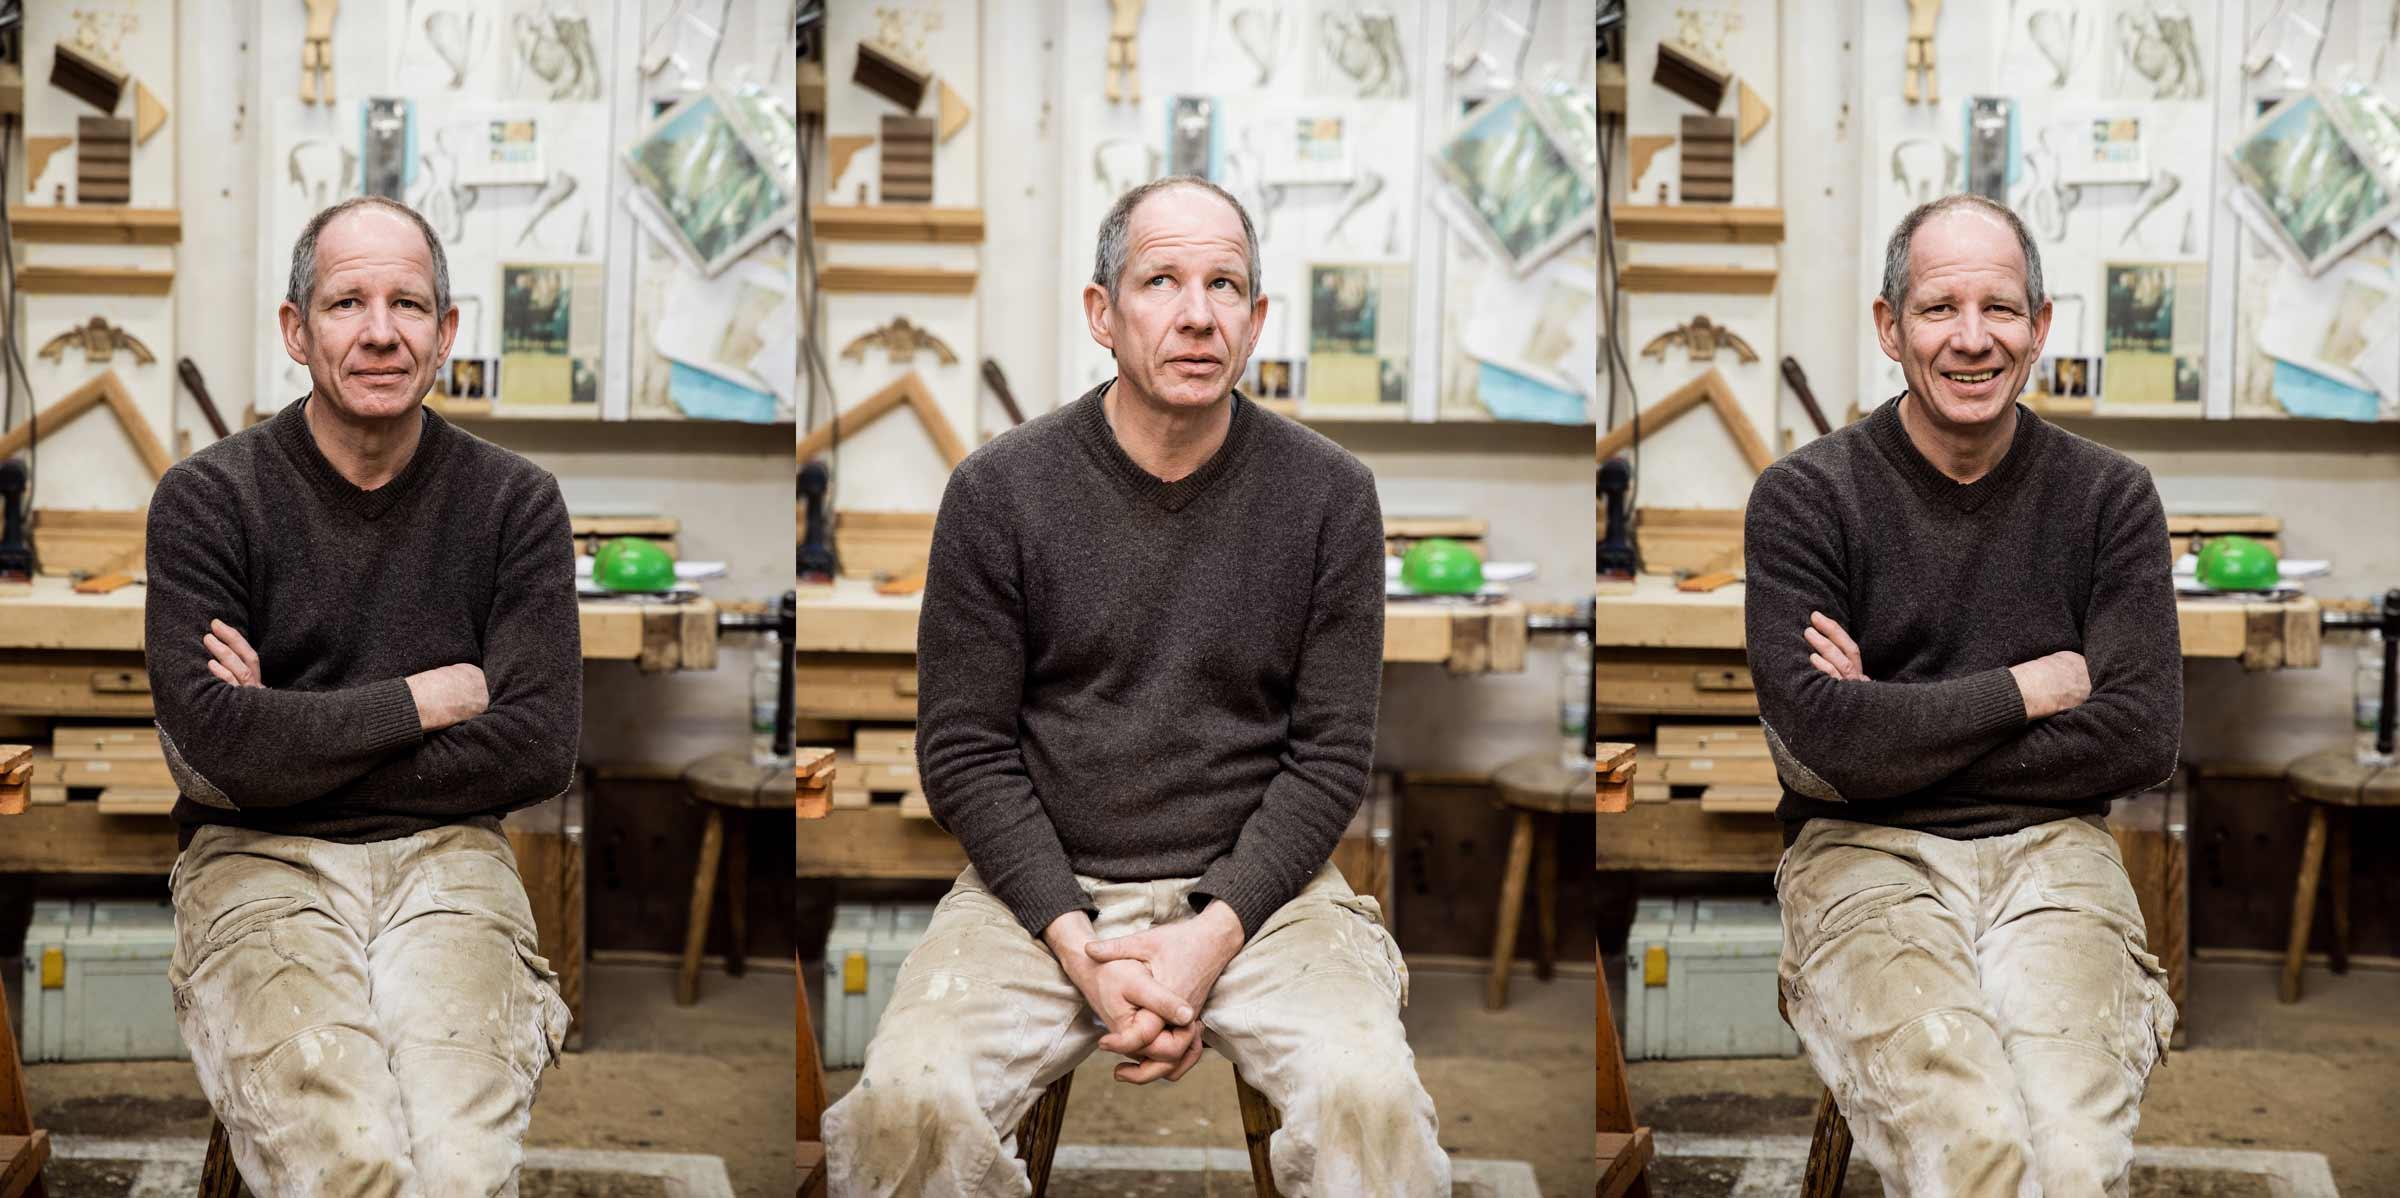 JK.Designermöbel, Jörn Konrad, Portrait